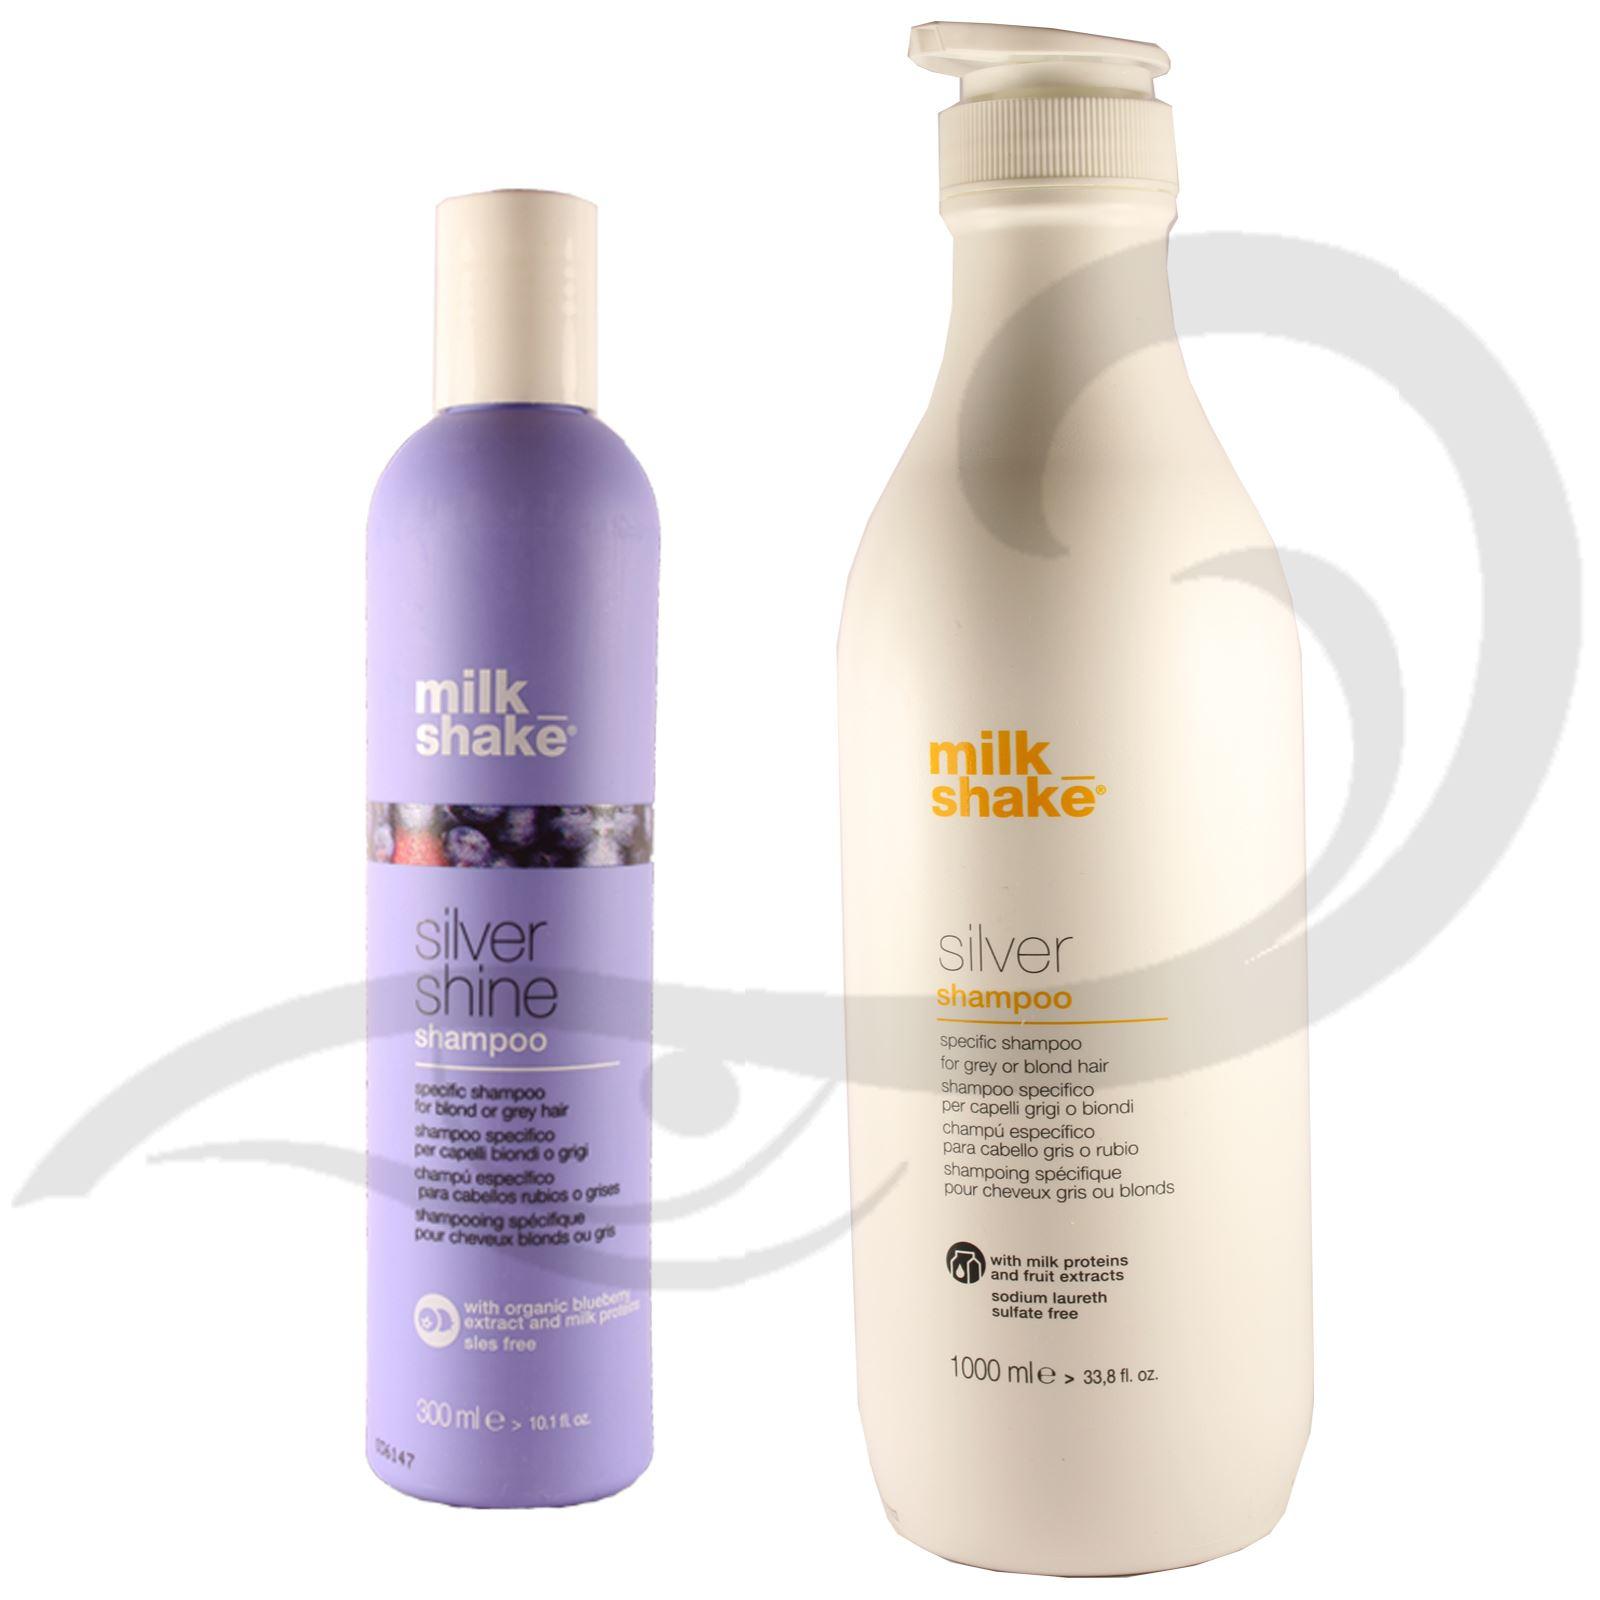 The Go Blonder hair-lightening shampoo and hair-lightening conditioner John Frieda Sheer Blonde Go Blonder Lightening Shampoo and Conditioner, New Fluid Ounce by John Frieda.